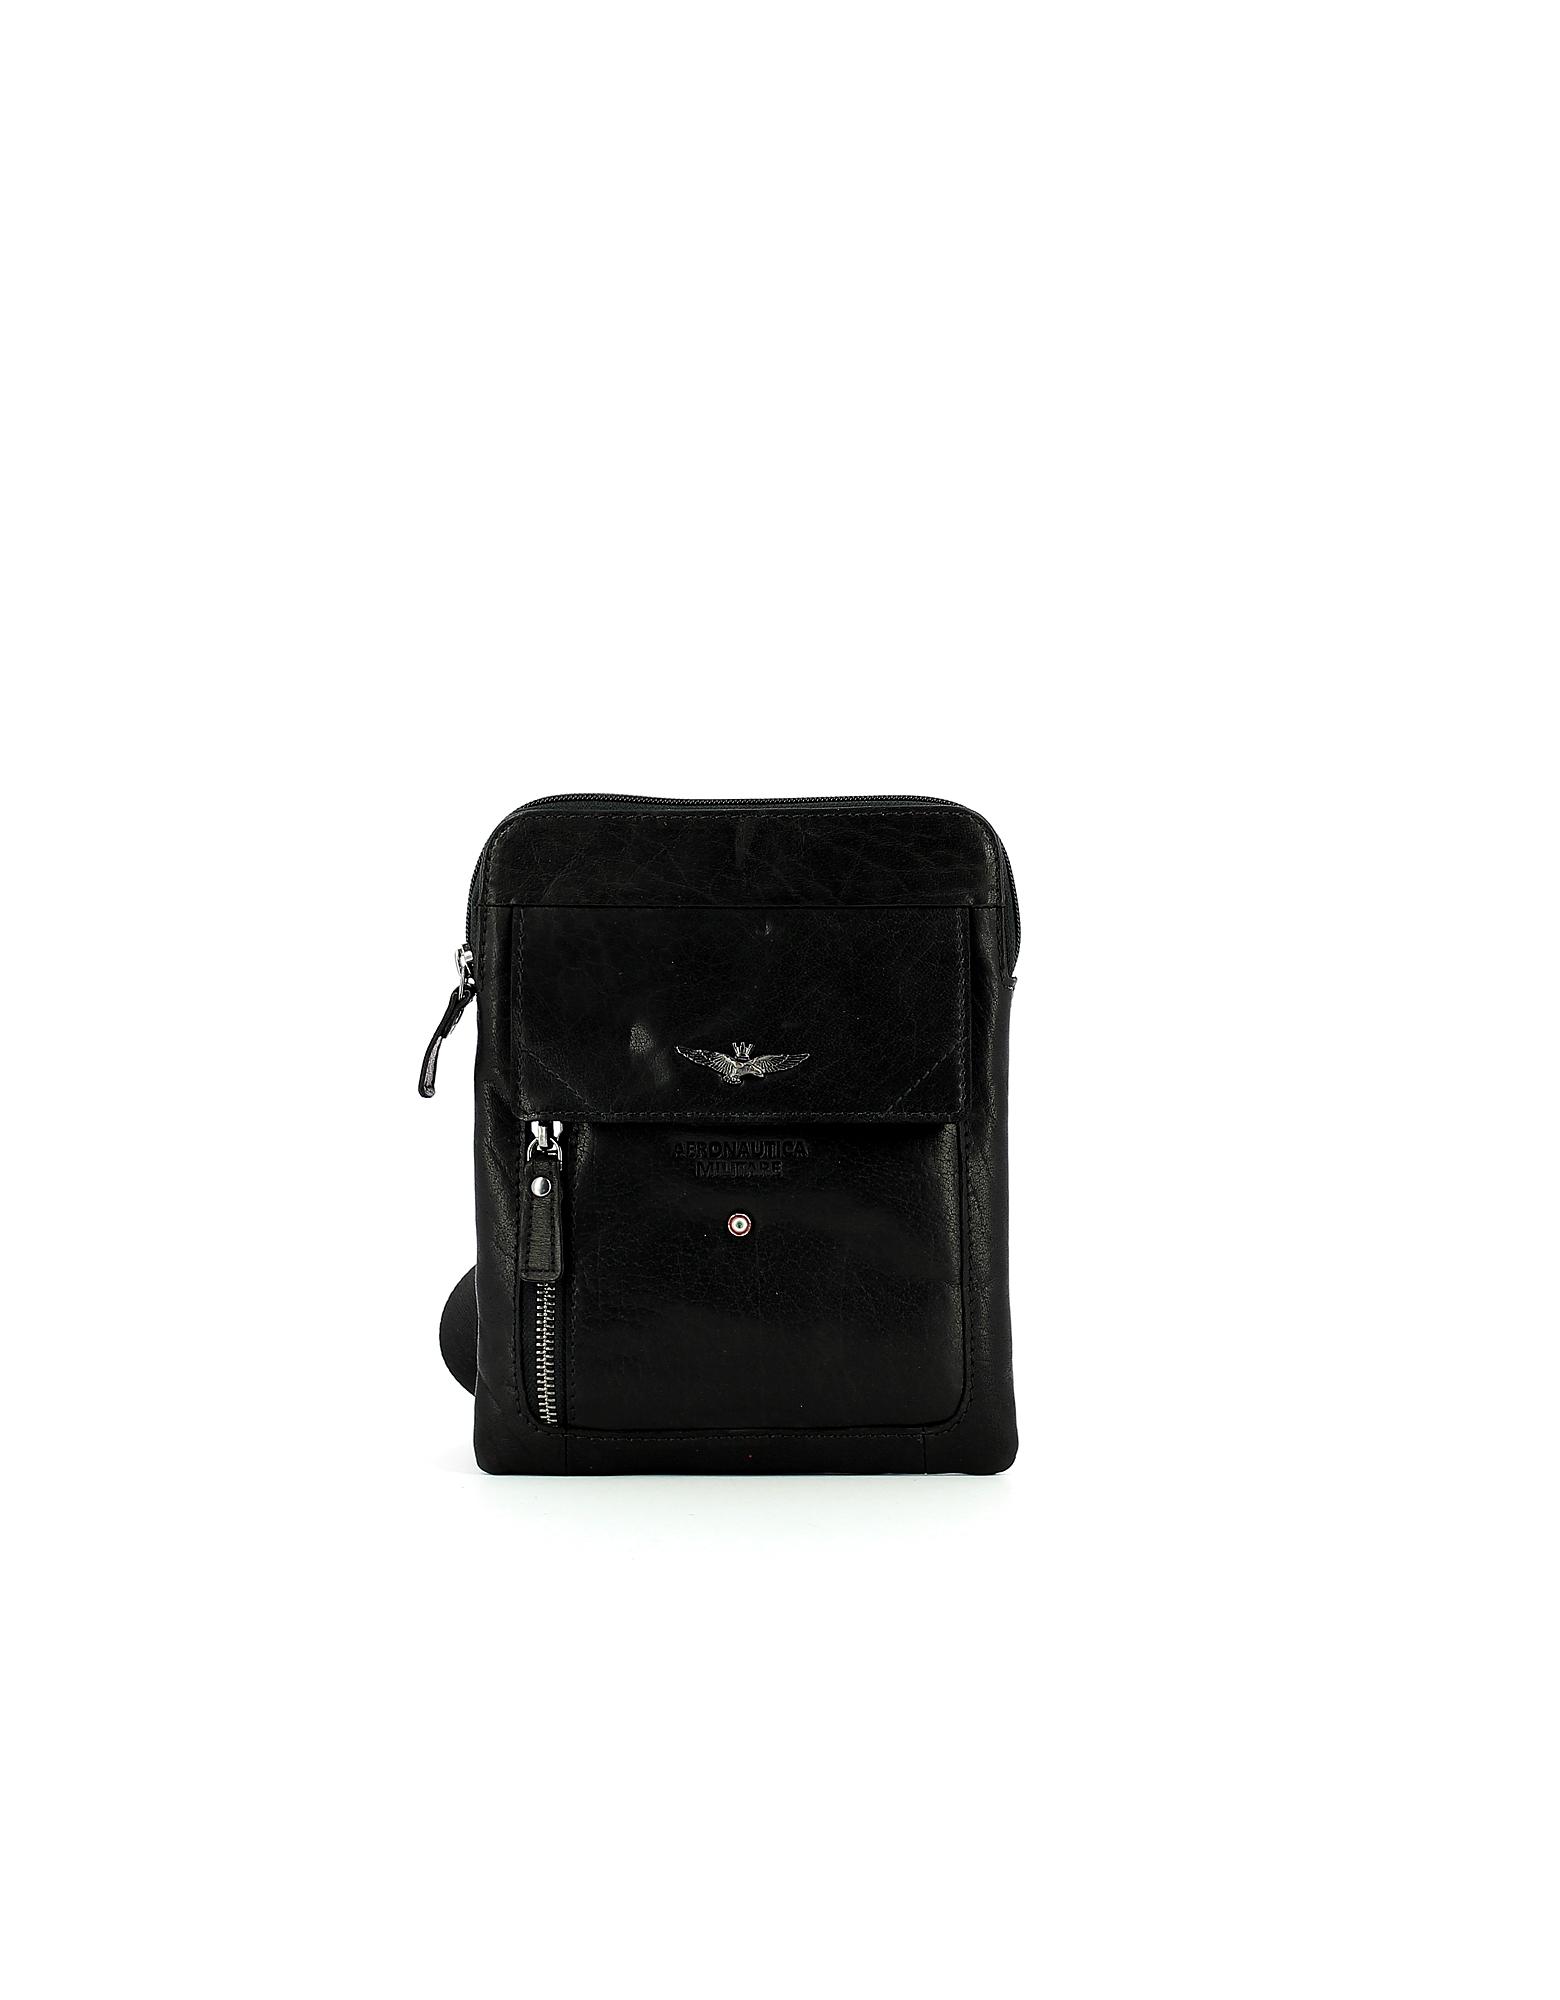 Aeronautica Militare Designer Handbags, Black Crossbody Bag